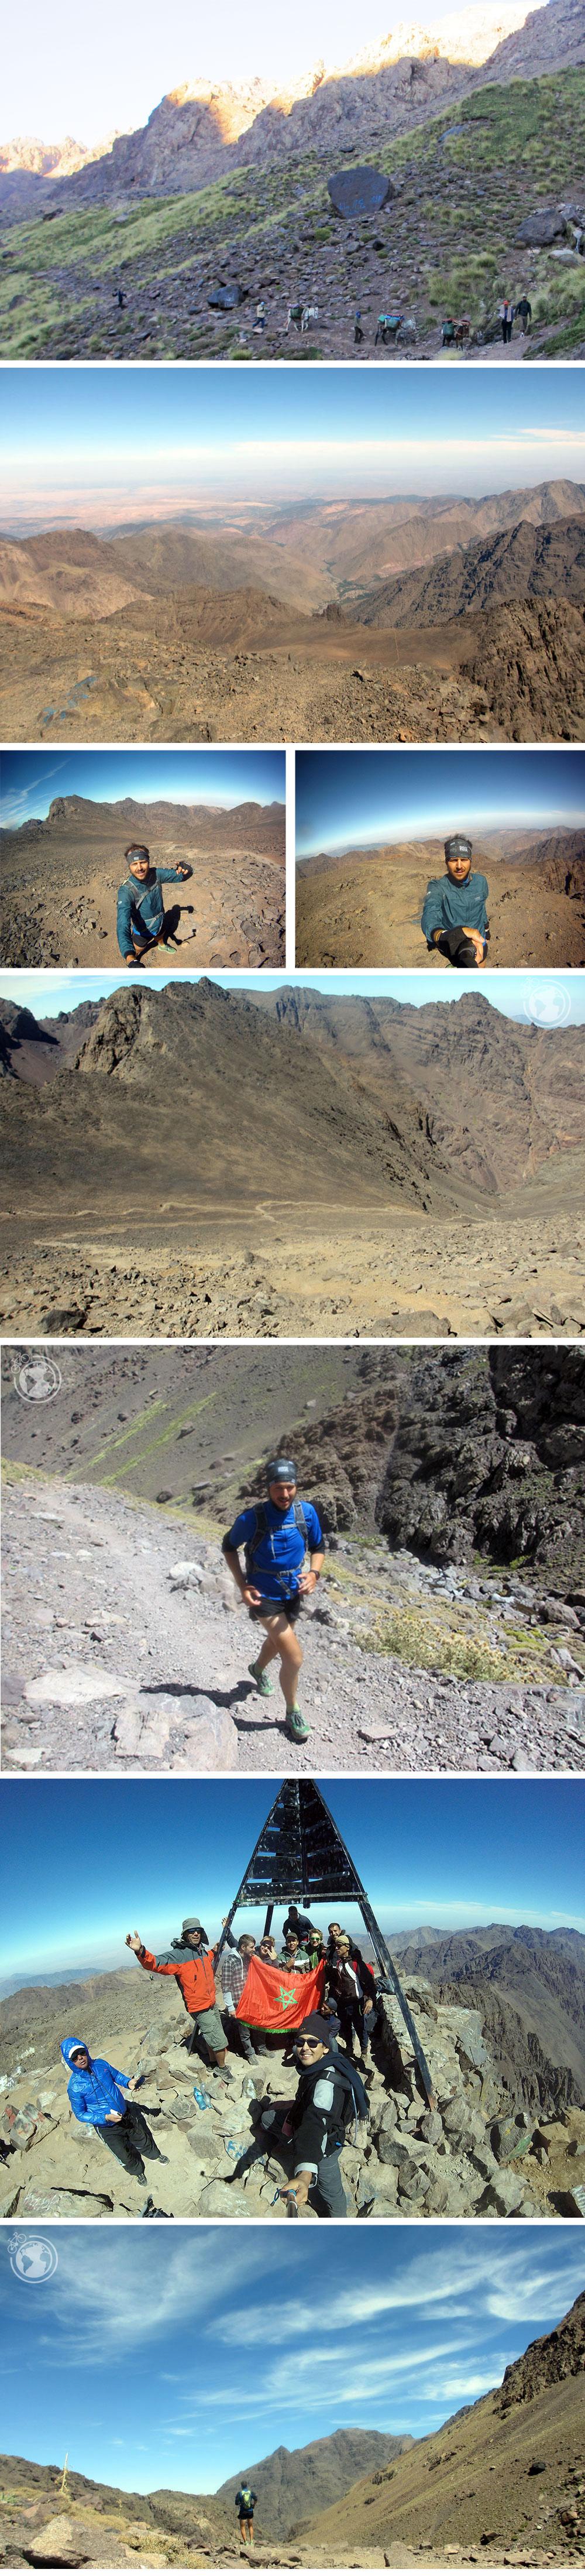 Subida al Monte Toubkal